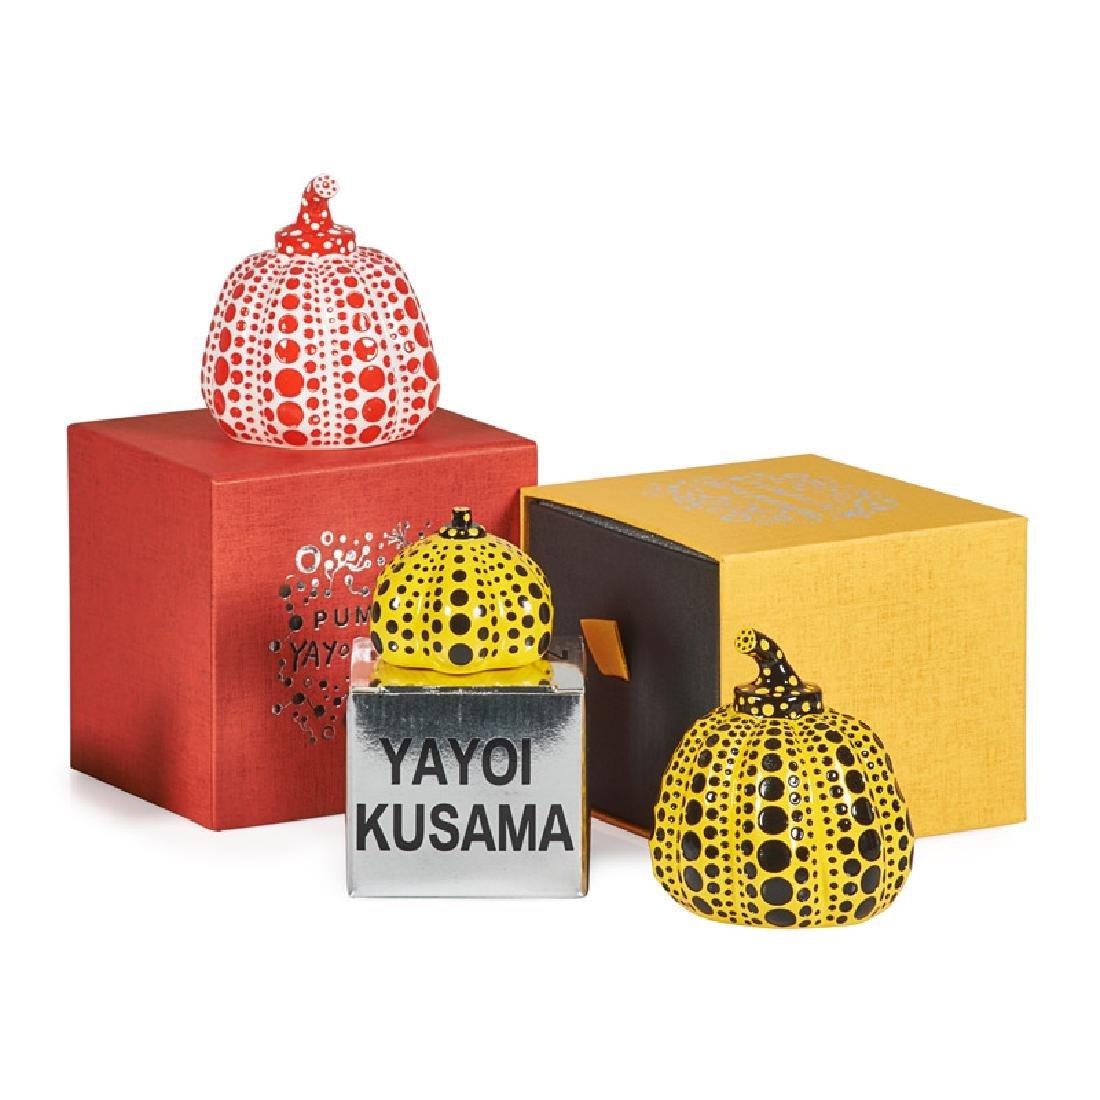 Yayoi Kusama (Japanese, b. 1929)